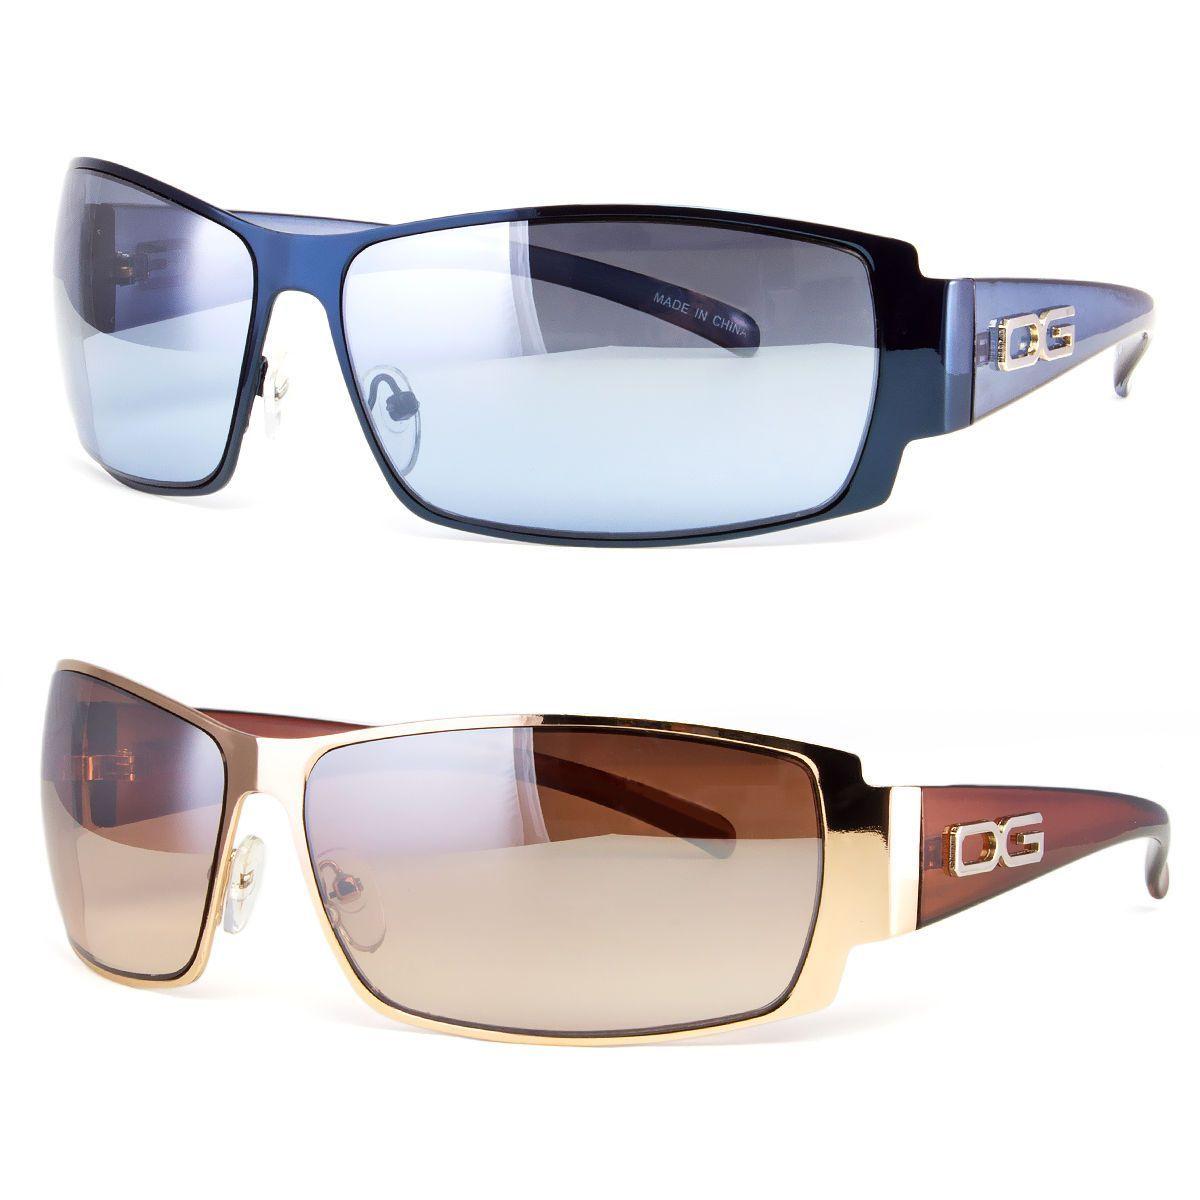 DG Eyewear Designer Shades Womens Ladies Vintage Cool Classic Fashion Sunglasses